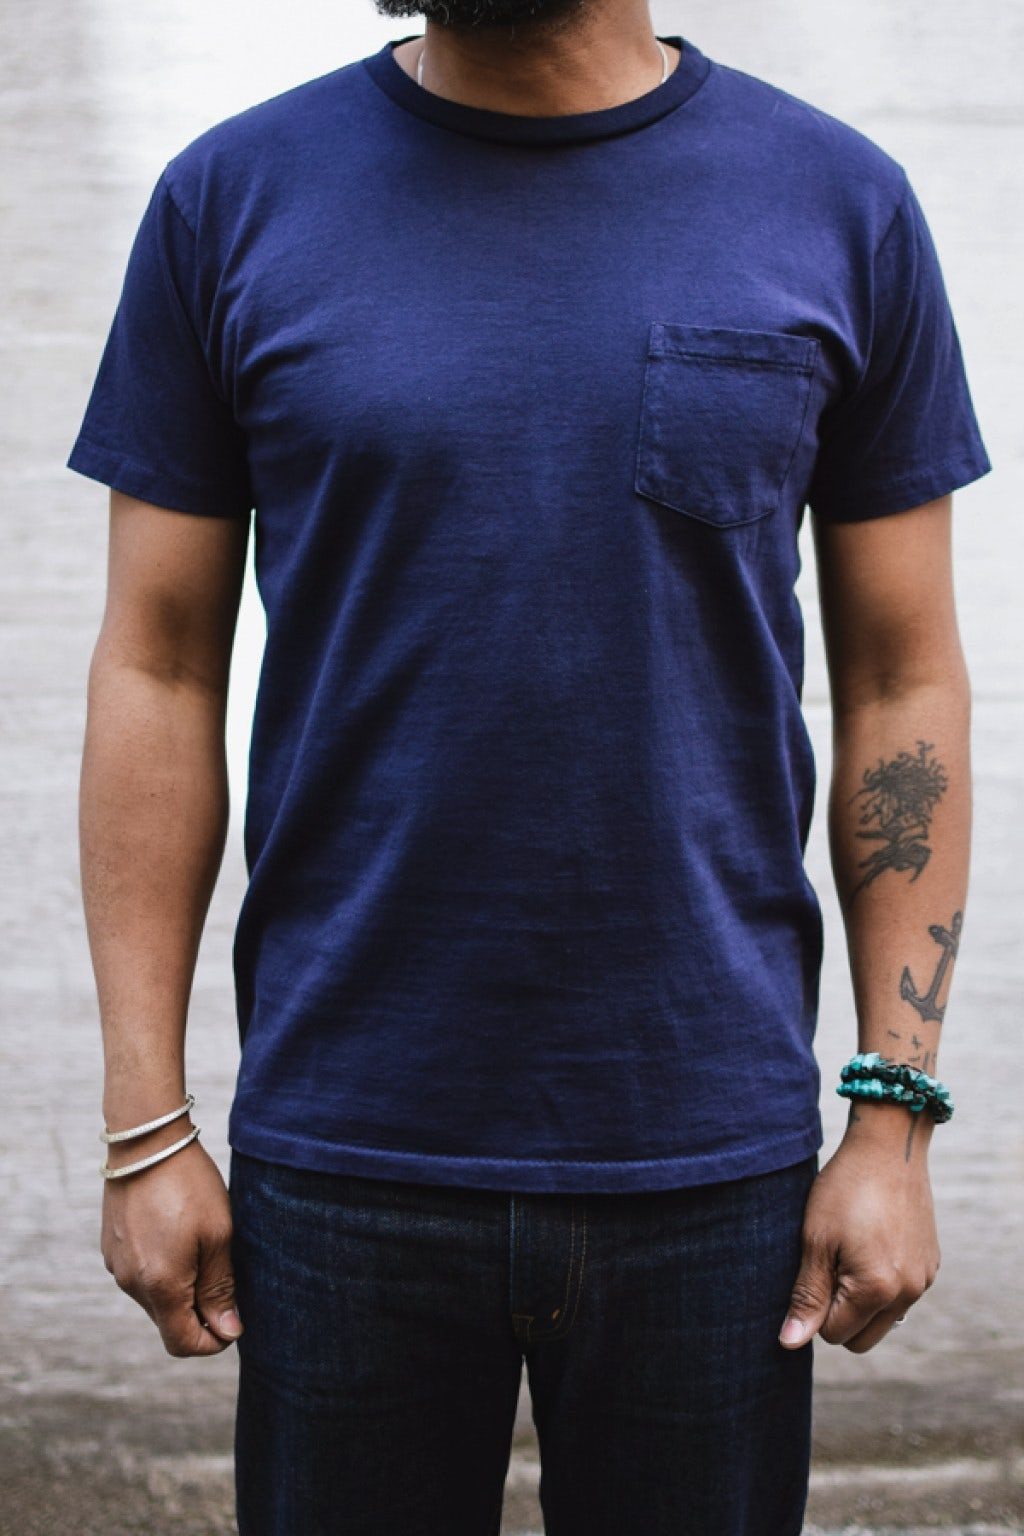 Velva Sheen Two Pack Pocket T-Shirts Navy